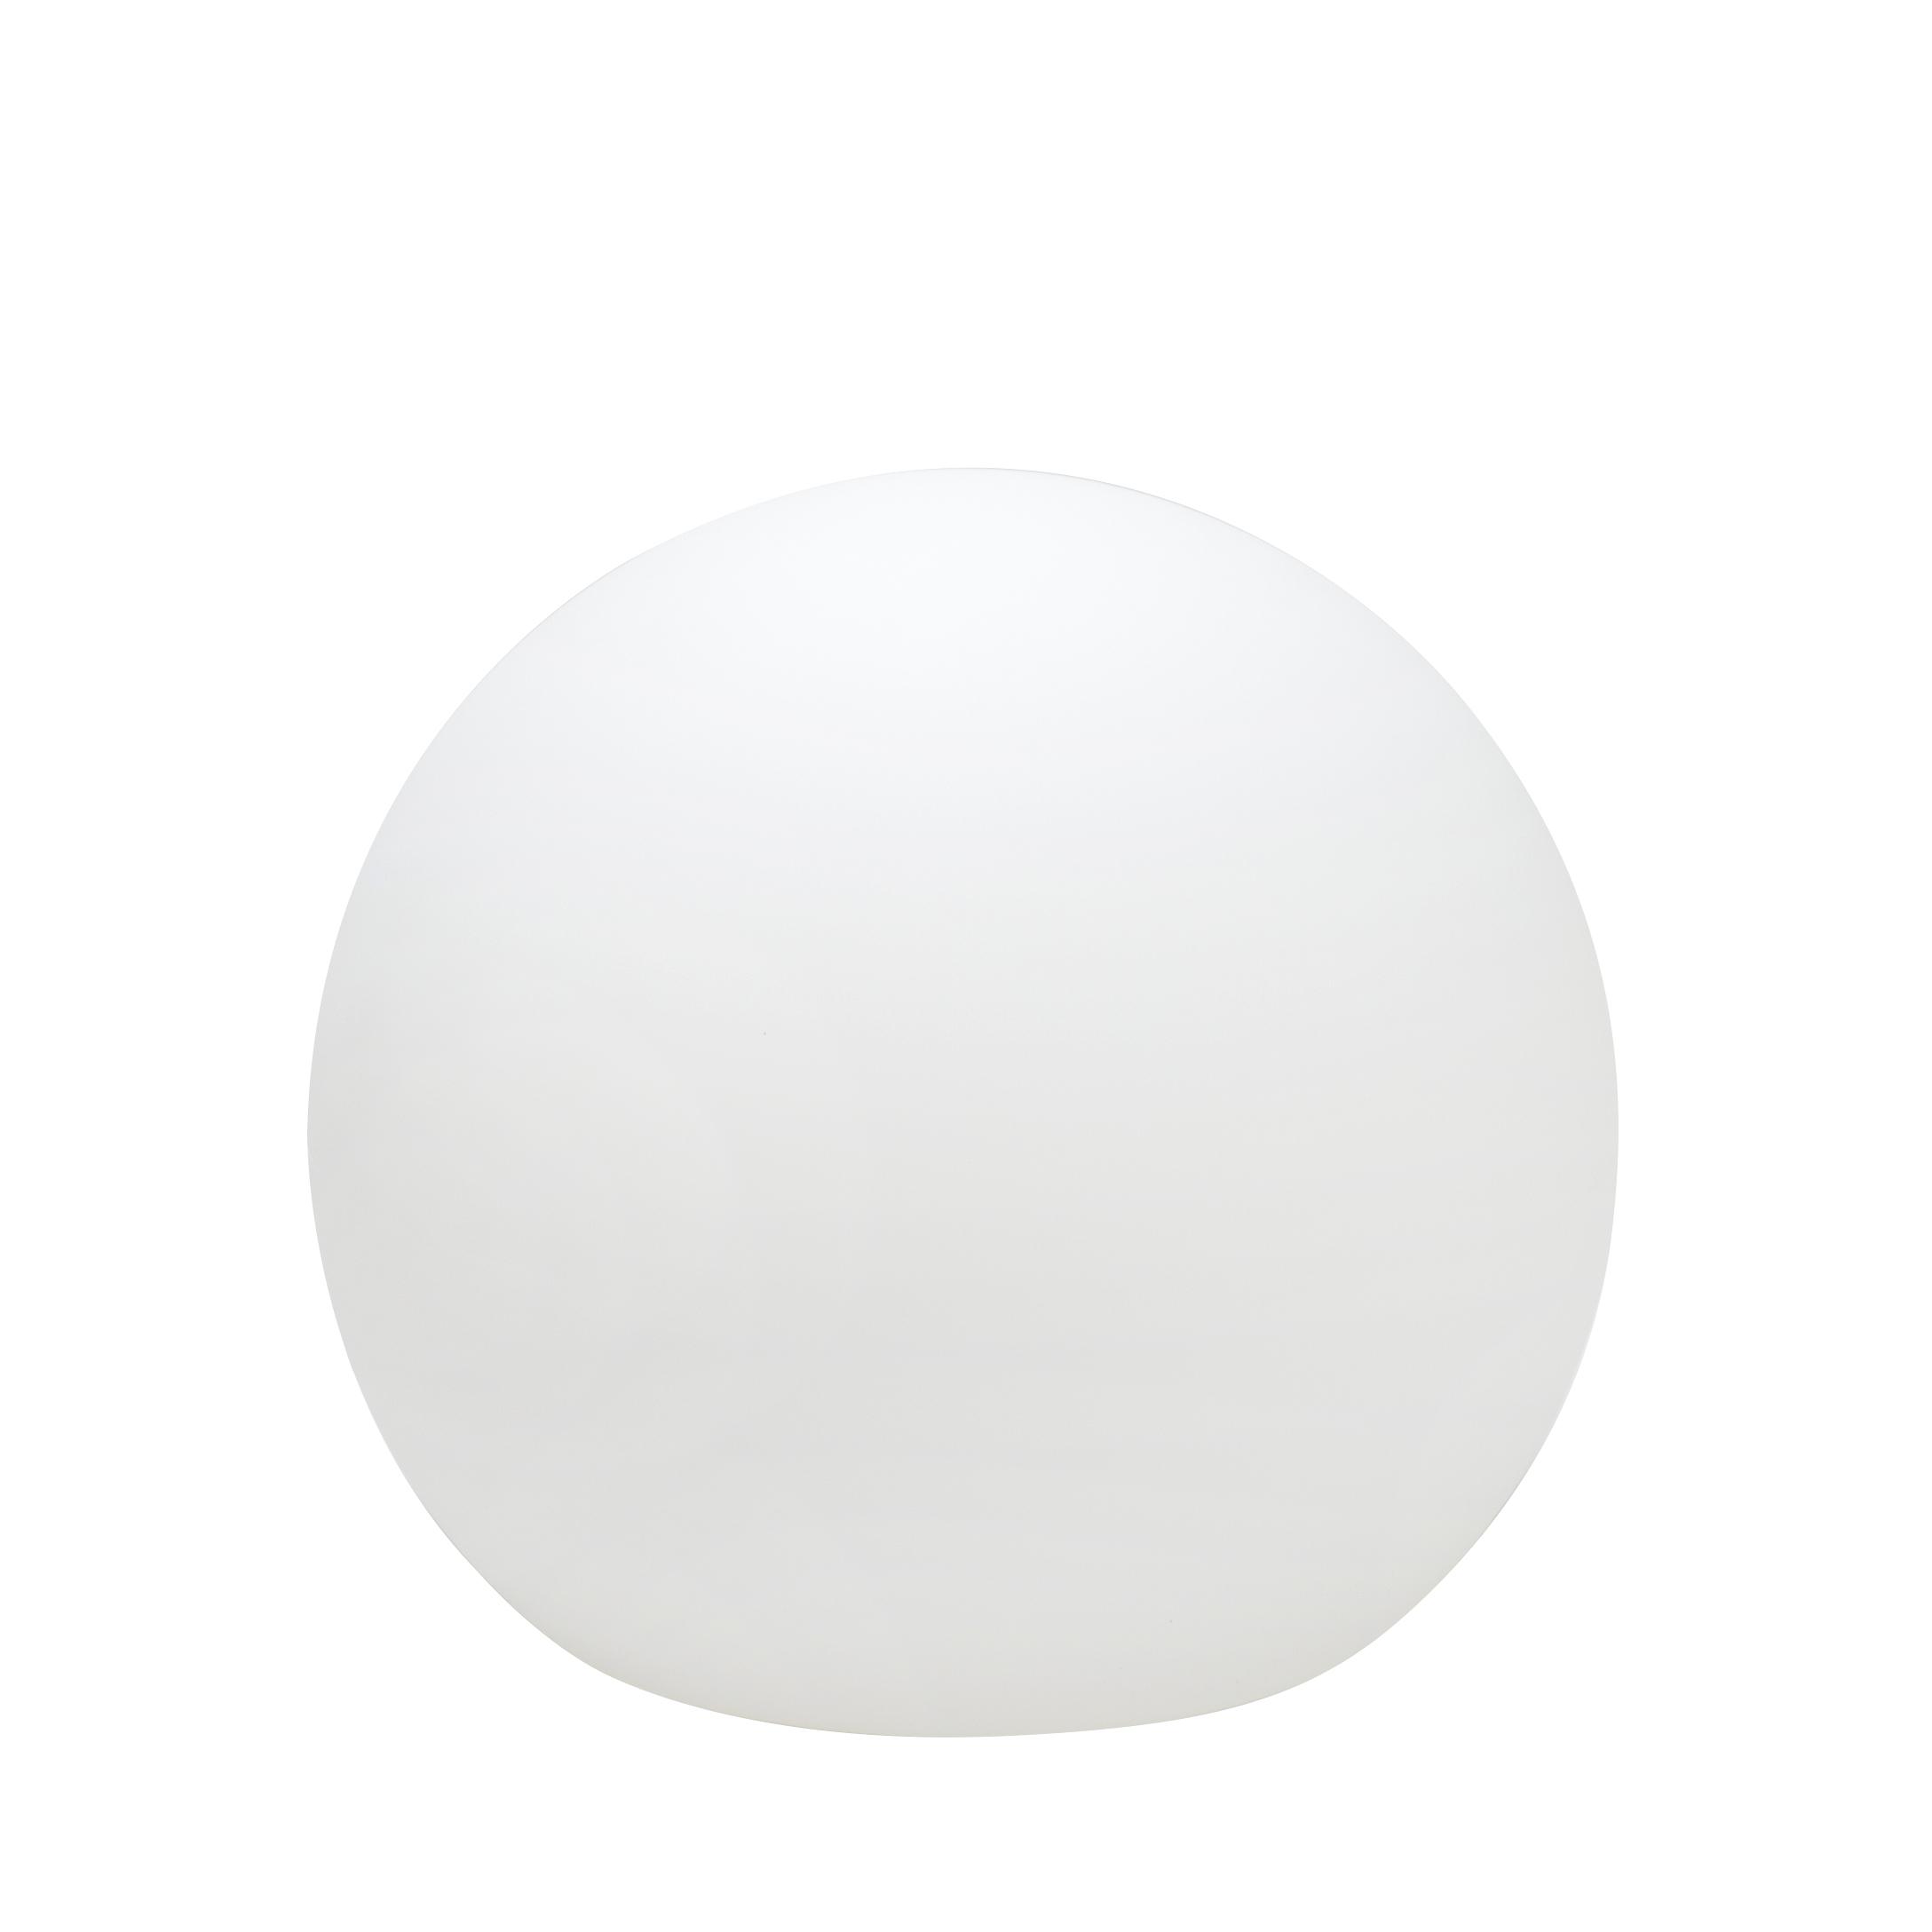 Boule lumineuse en pvc blanc